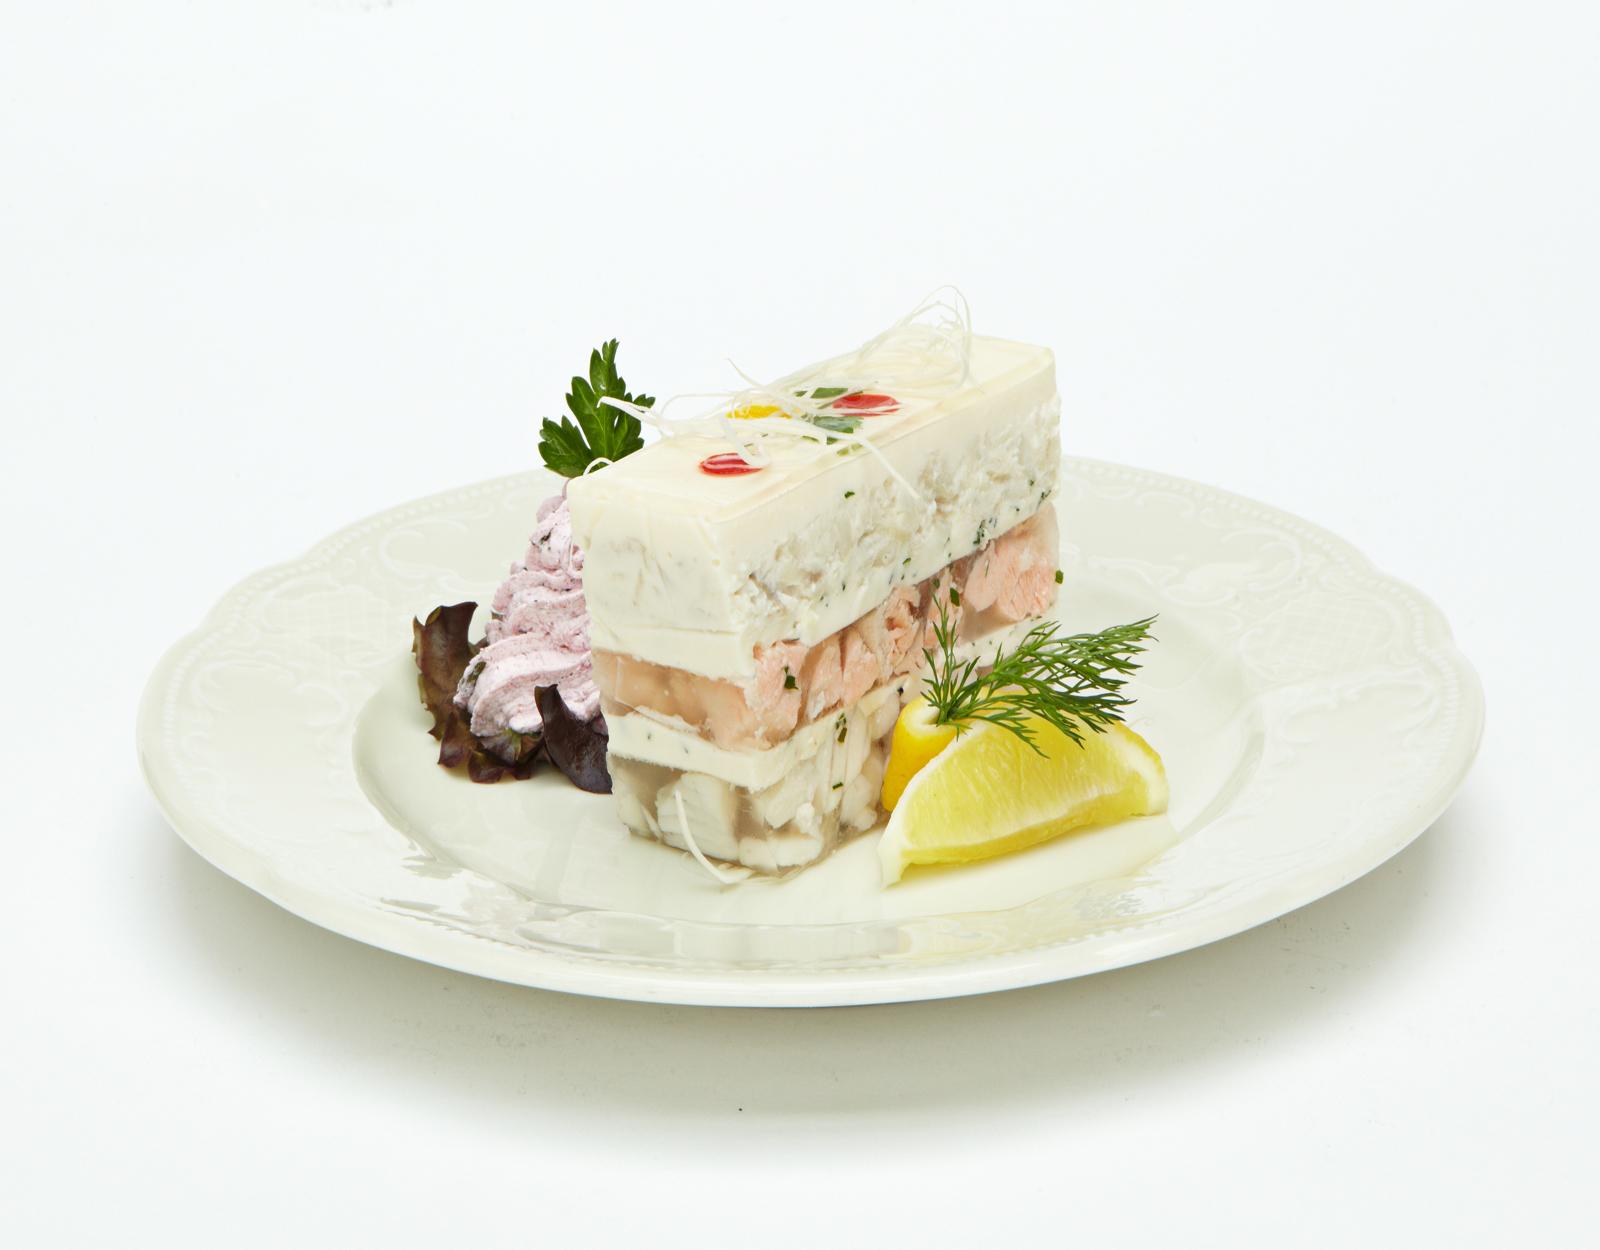 Заливное изъ щуки, судака и лососины подъ хреномъ